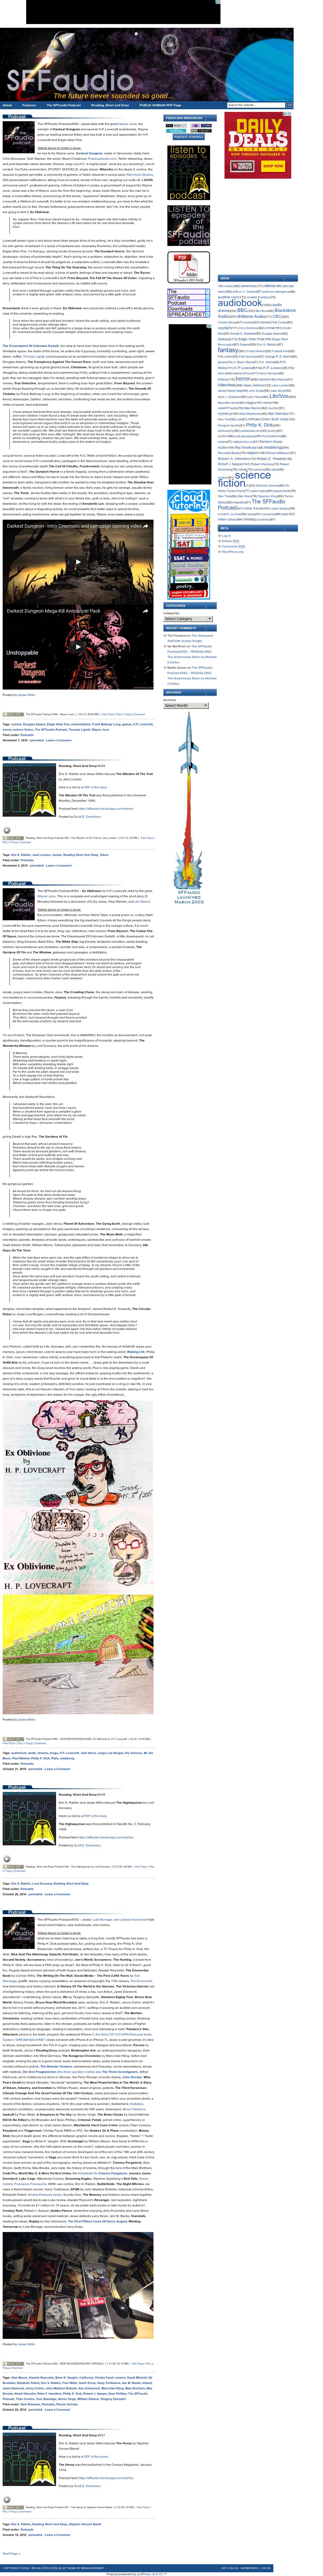 SFFaudio Competitors, Revenue and Employees - Owler Company Profile